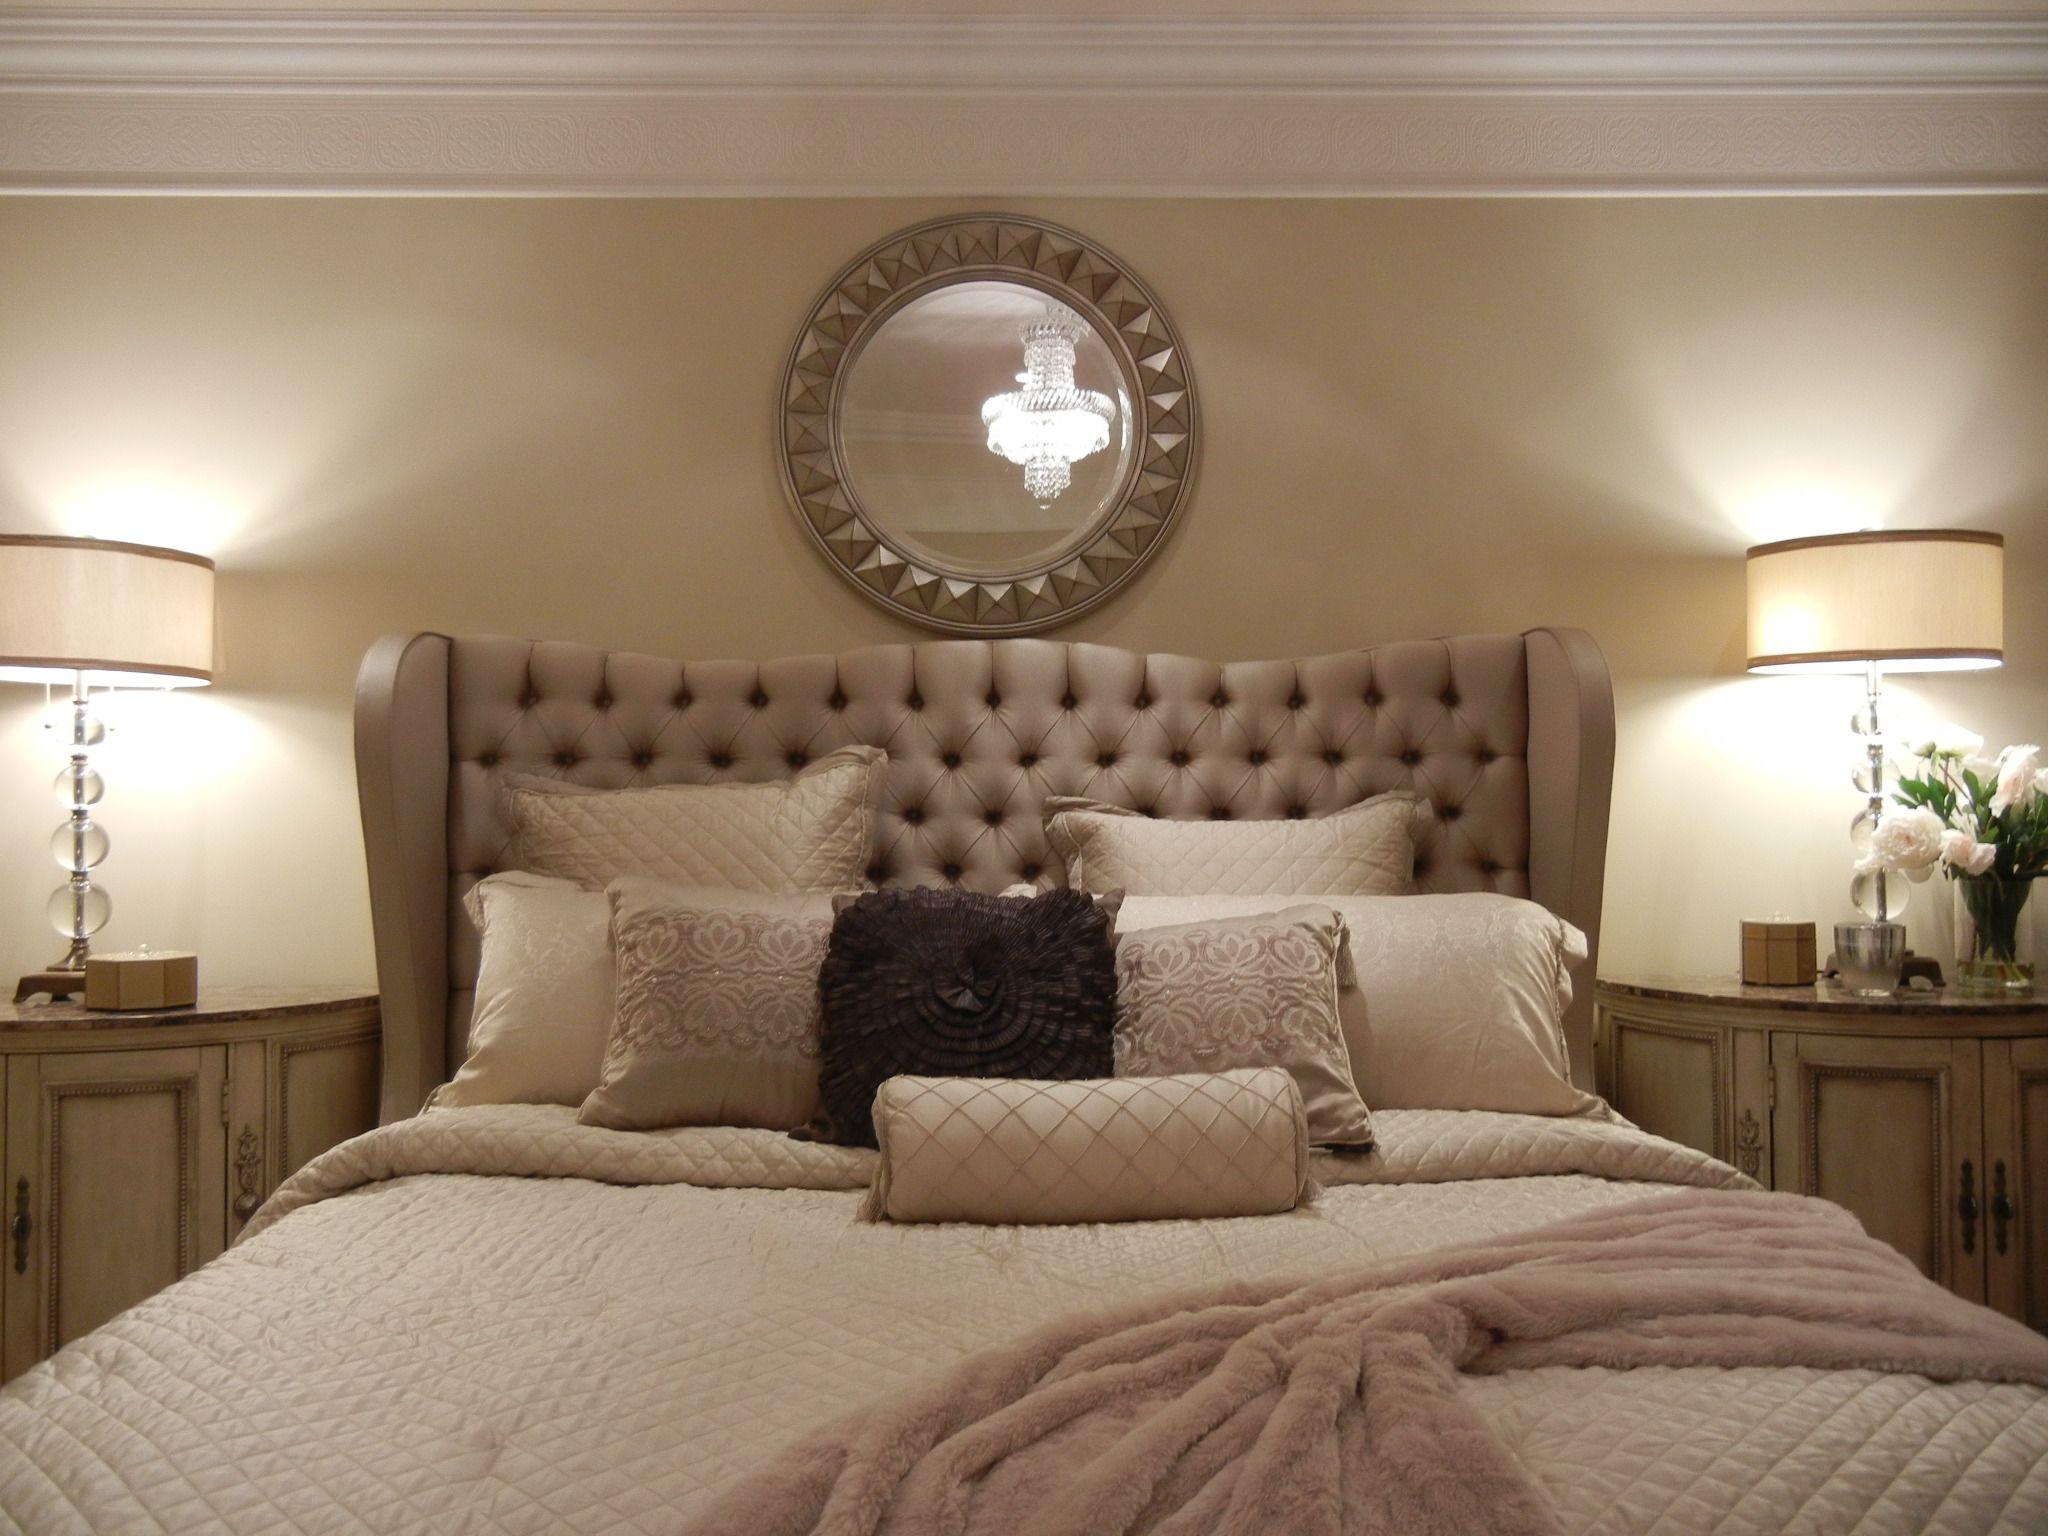 Beautiful Master Bedroom | Master bedrooms decor ...